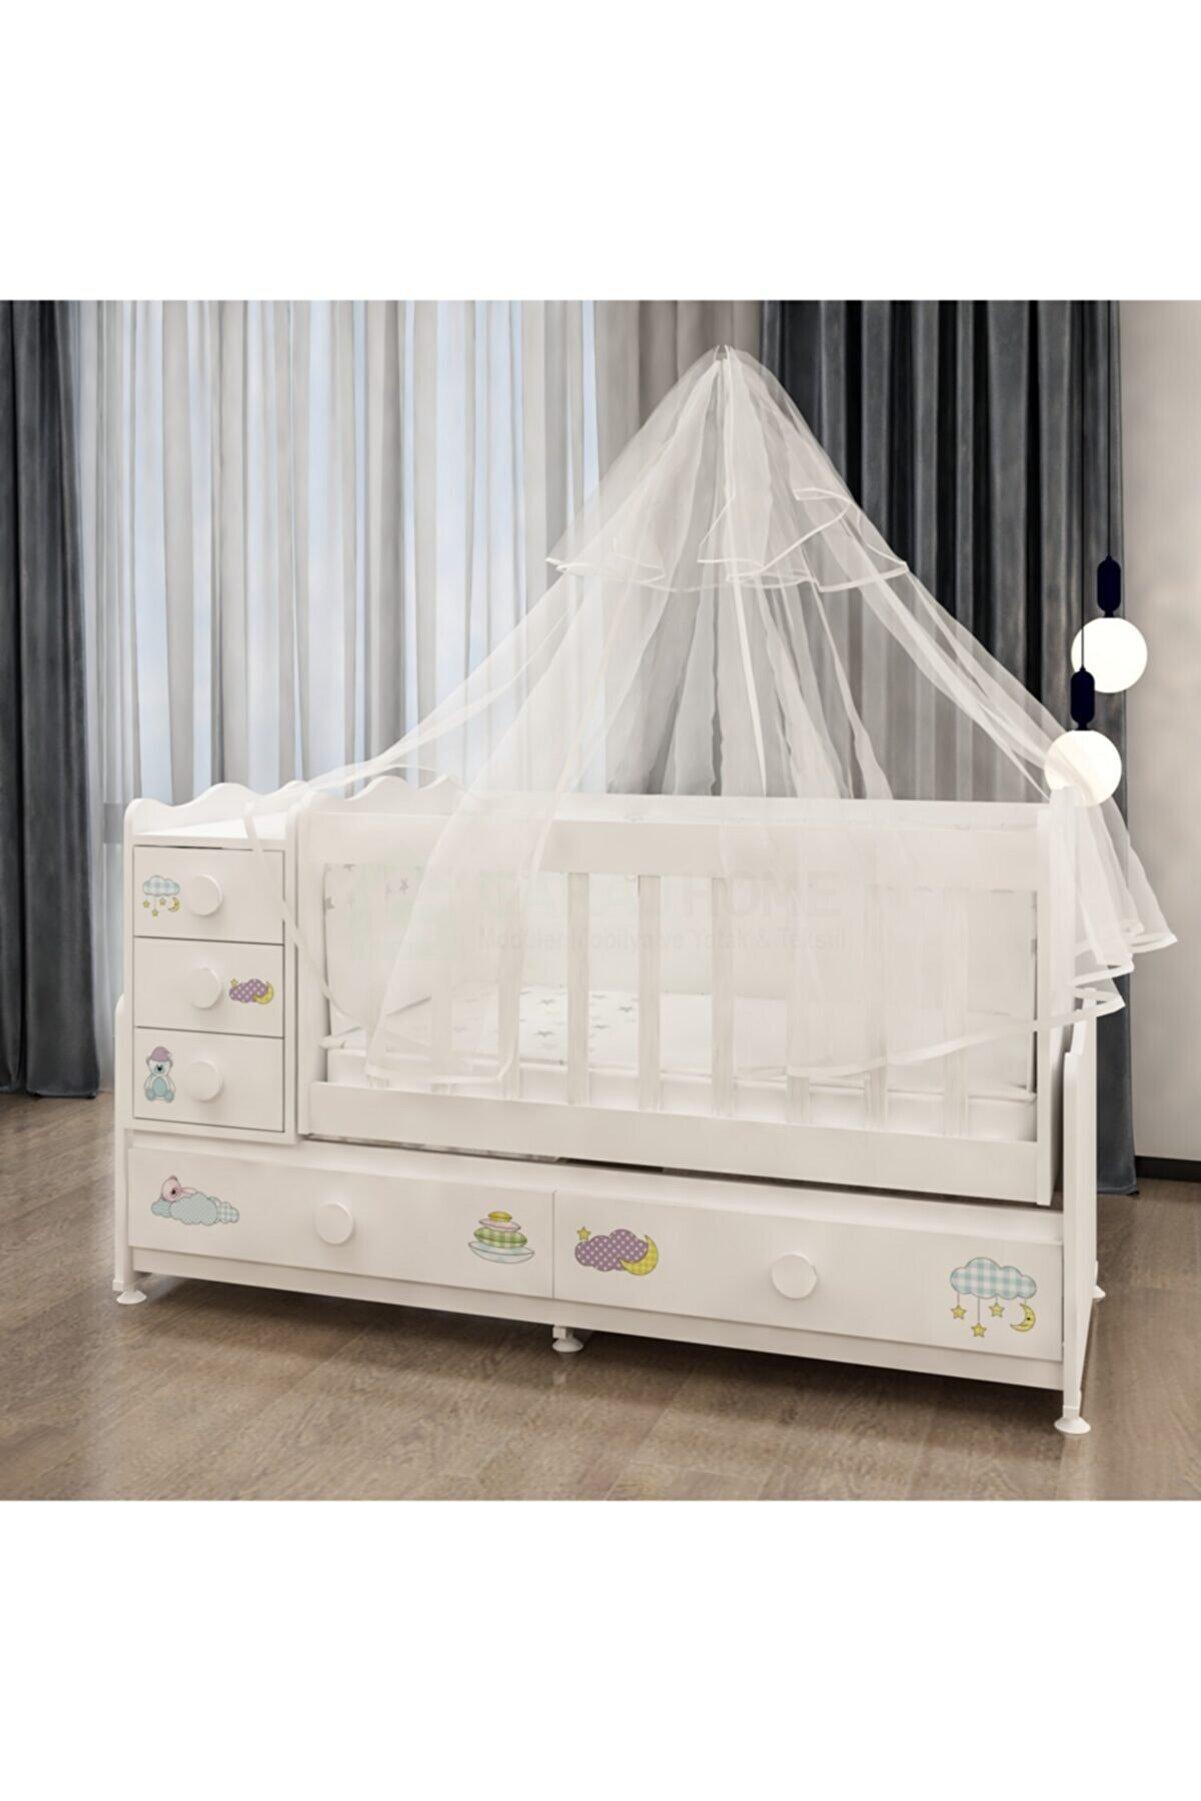 Garaj Home Melina Uykucu Uyku Setli Beşik Kombini- Uykuseti Beyaz